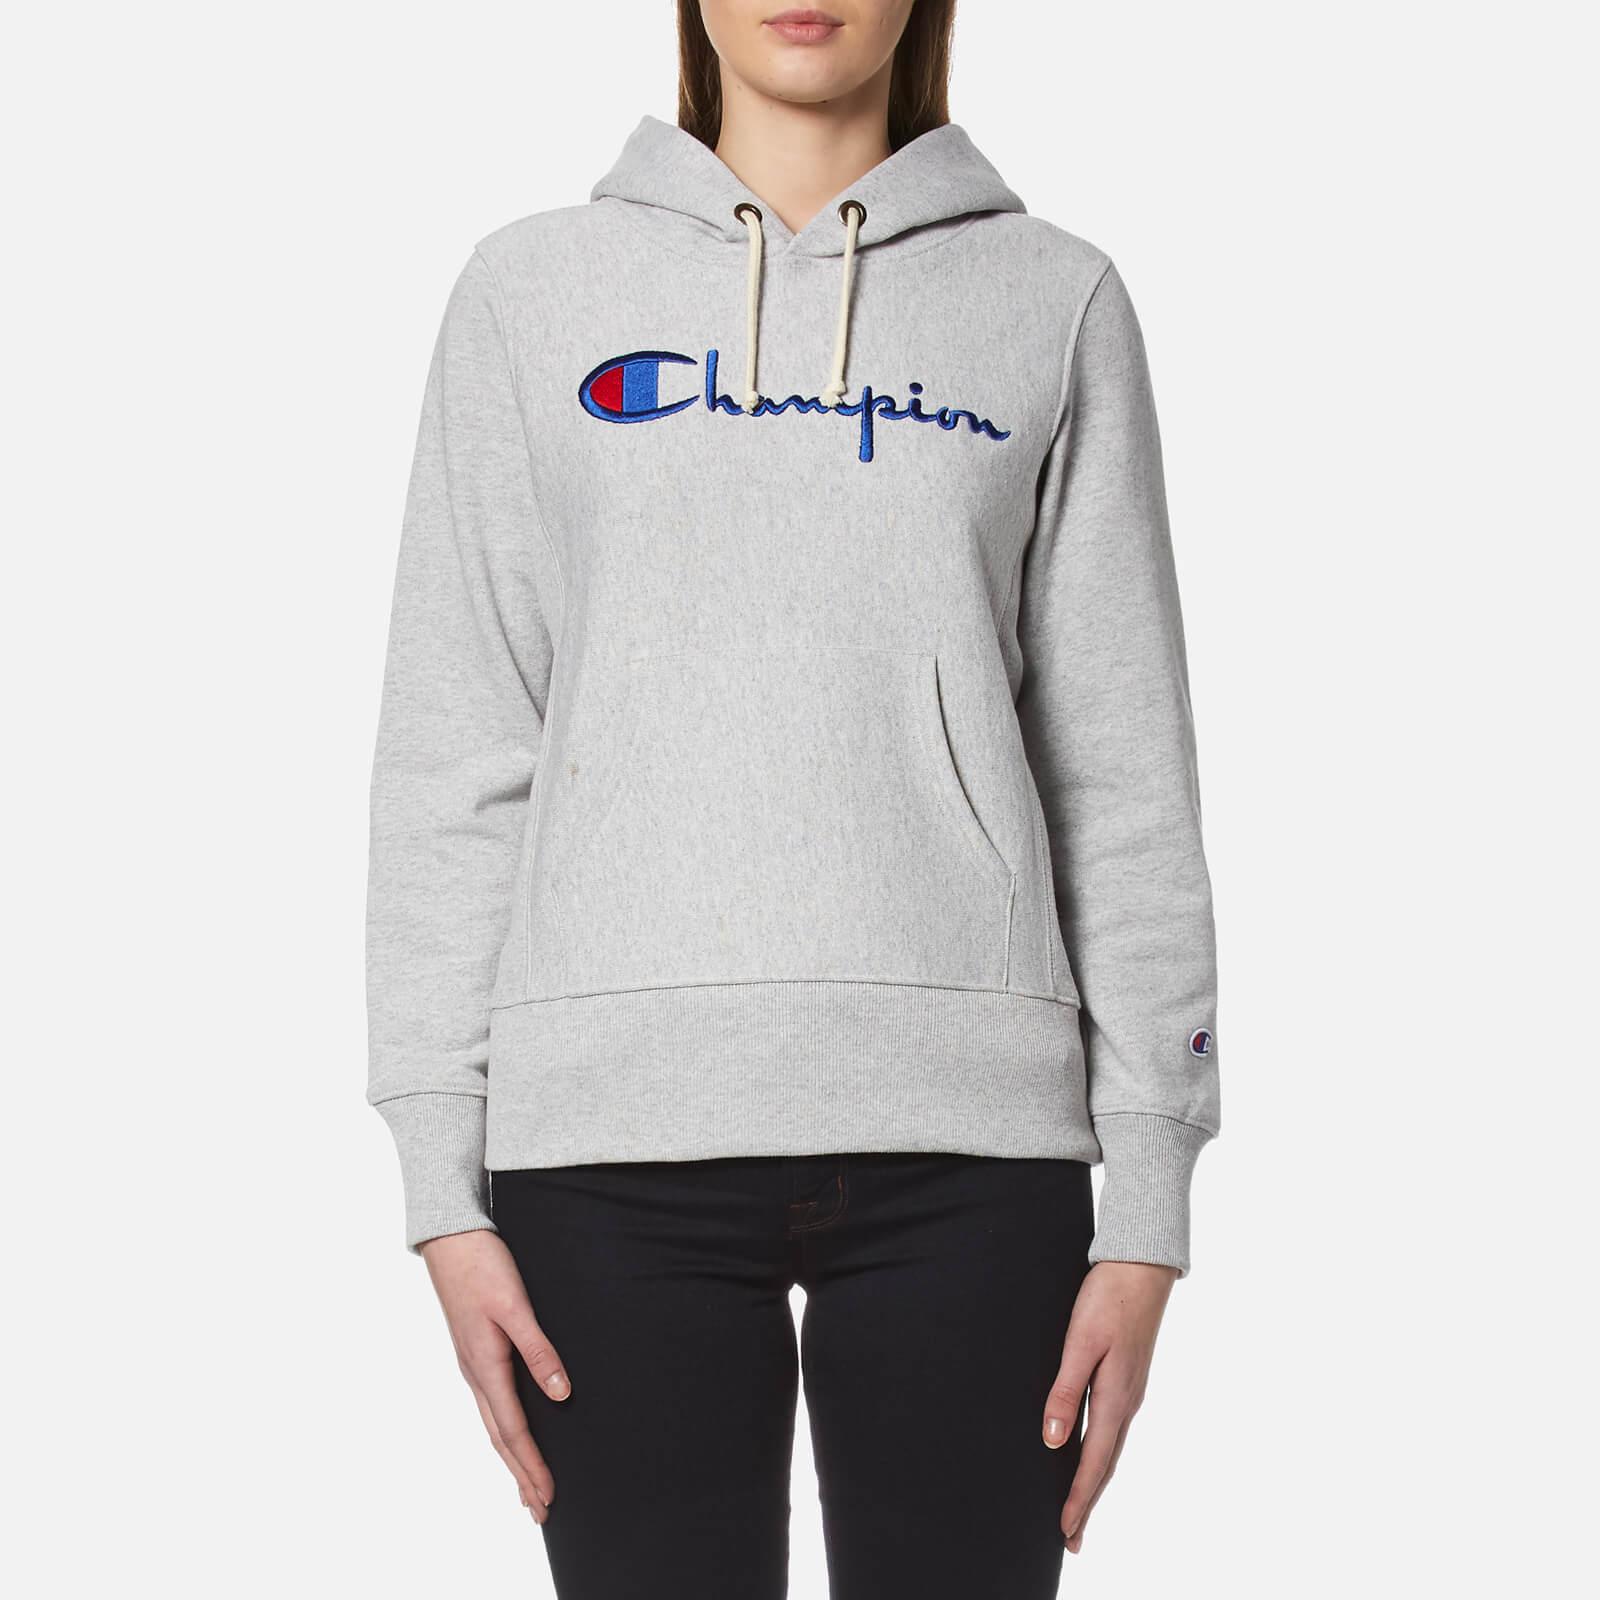 32f64ac4ca6a5 Champion Women s Hooded Sweatshirt - Grey Champion Women s Hooded Sweatshirt  - Grey